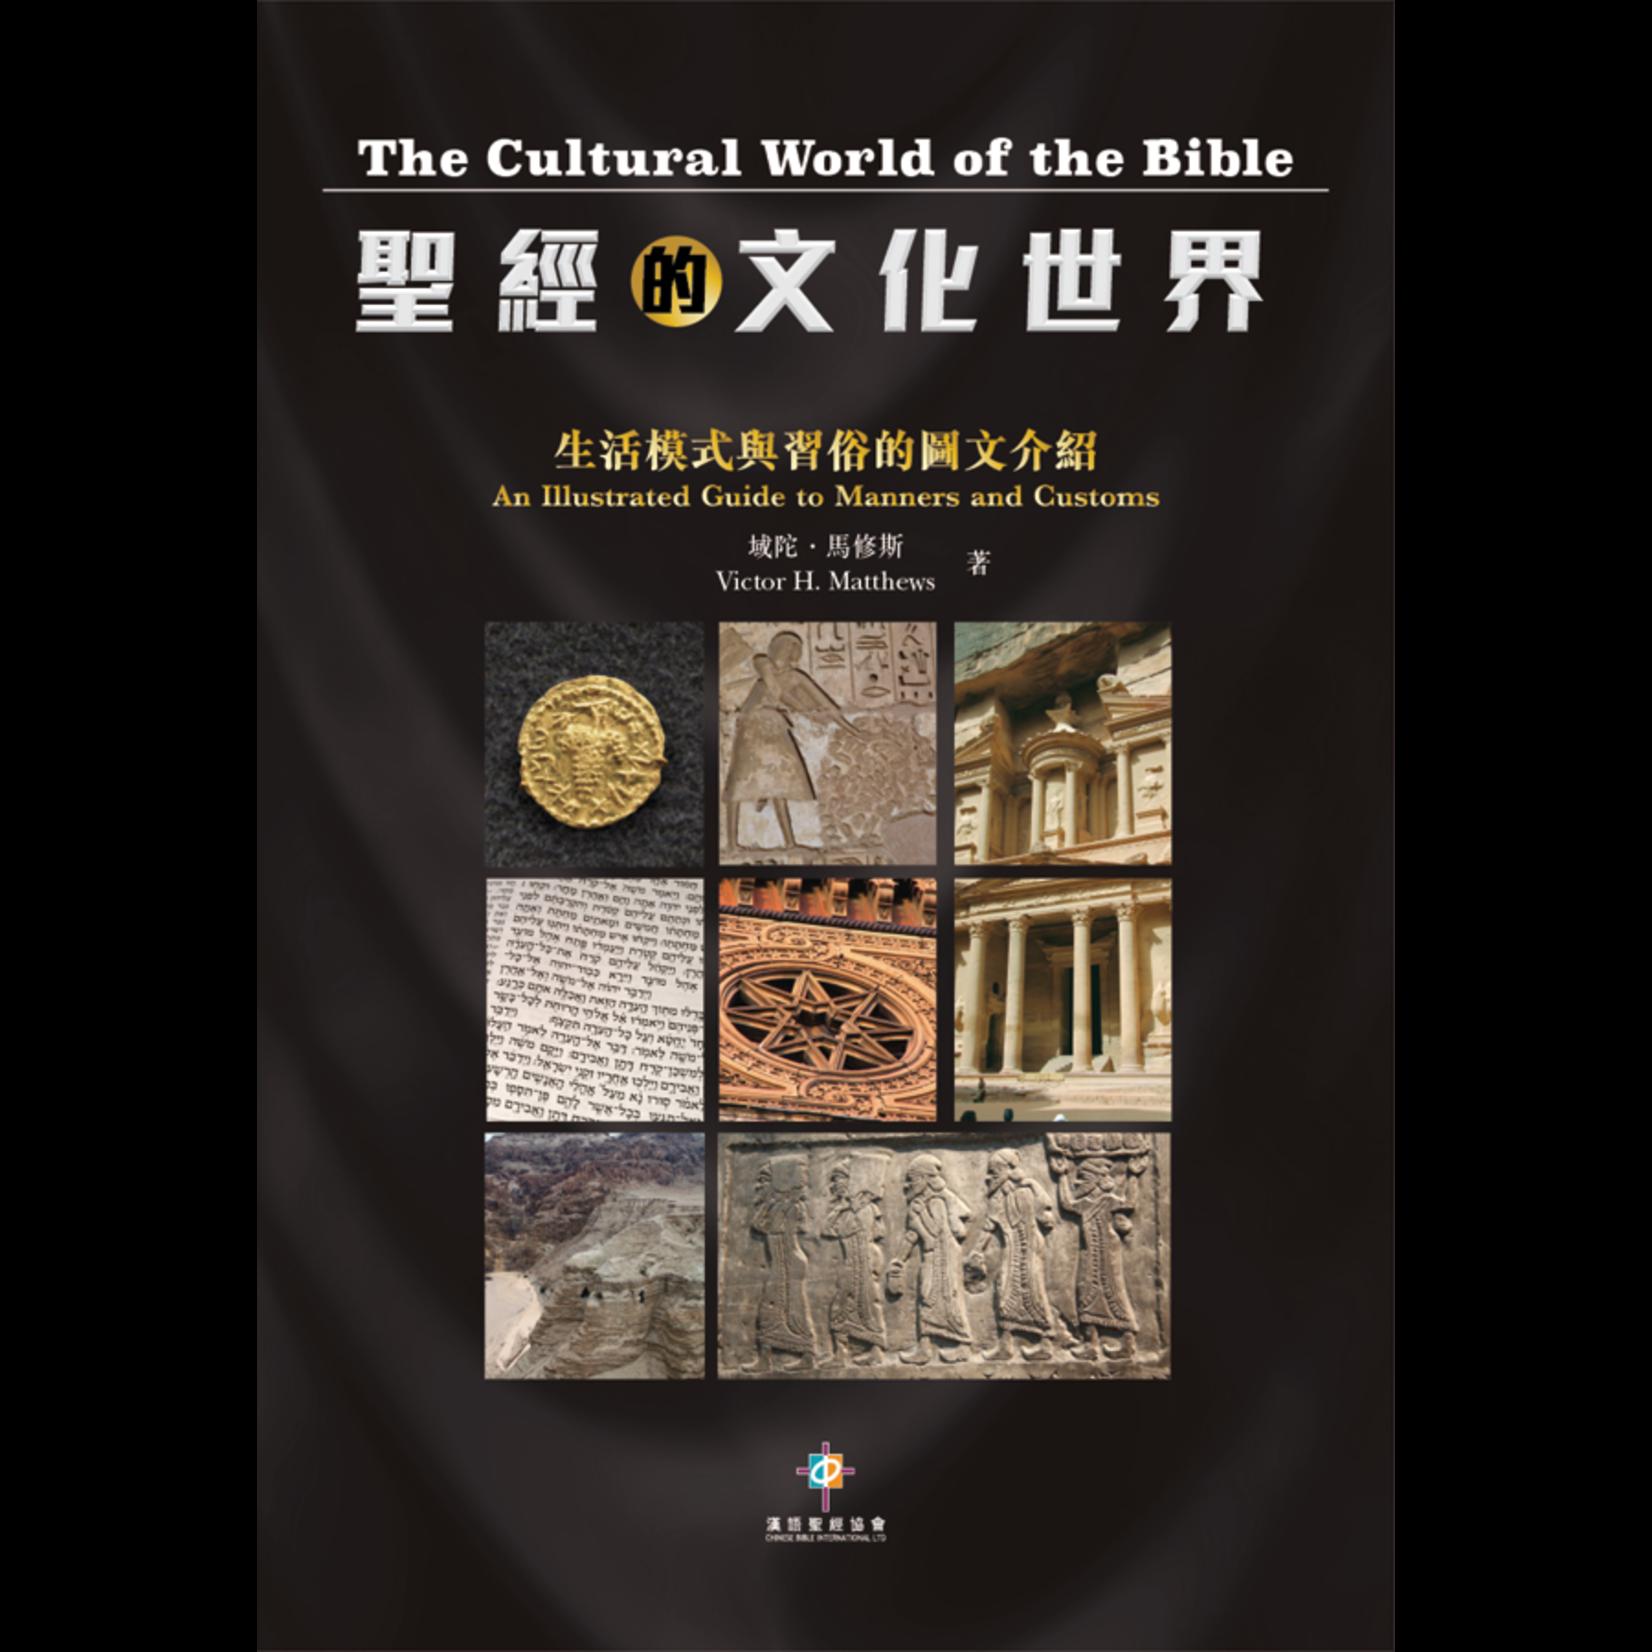 漢語聖經協會 Chinese Bible International 聖經的文化世界:生活模式與習俗的圖文介紹 The Cultural World of the Bible: An Illustrated Guide to Manners and Customs